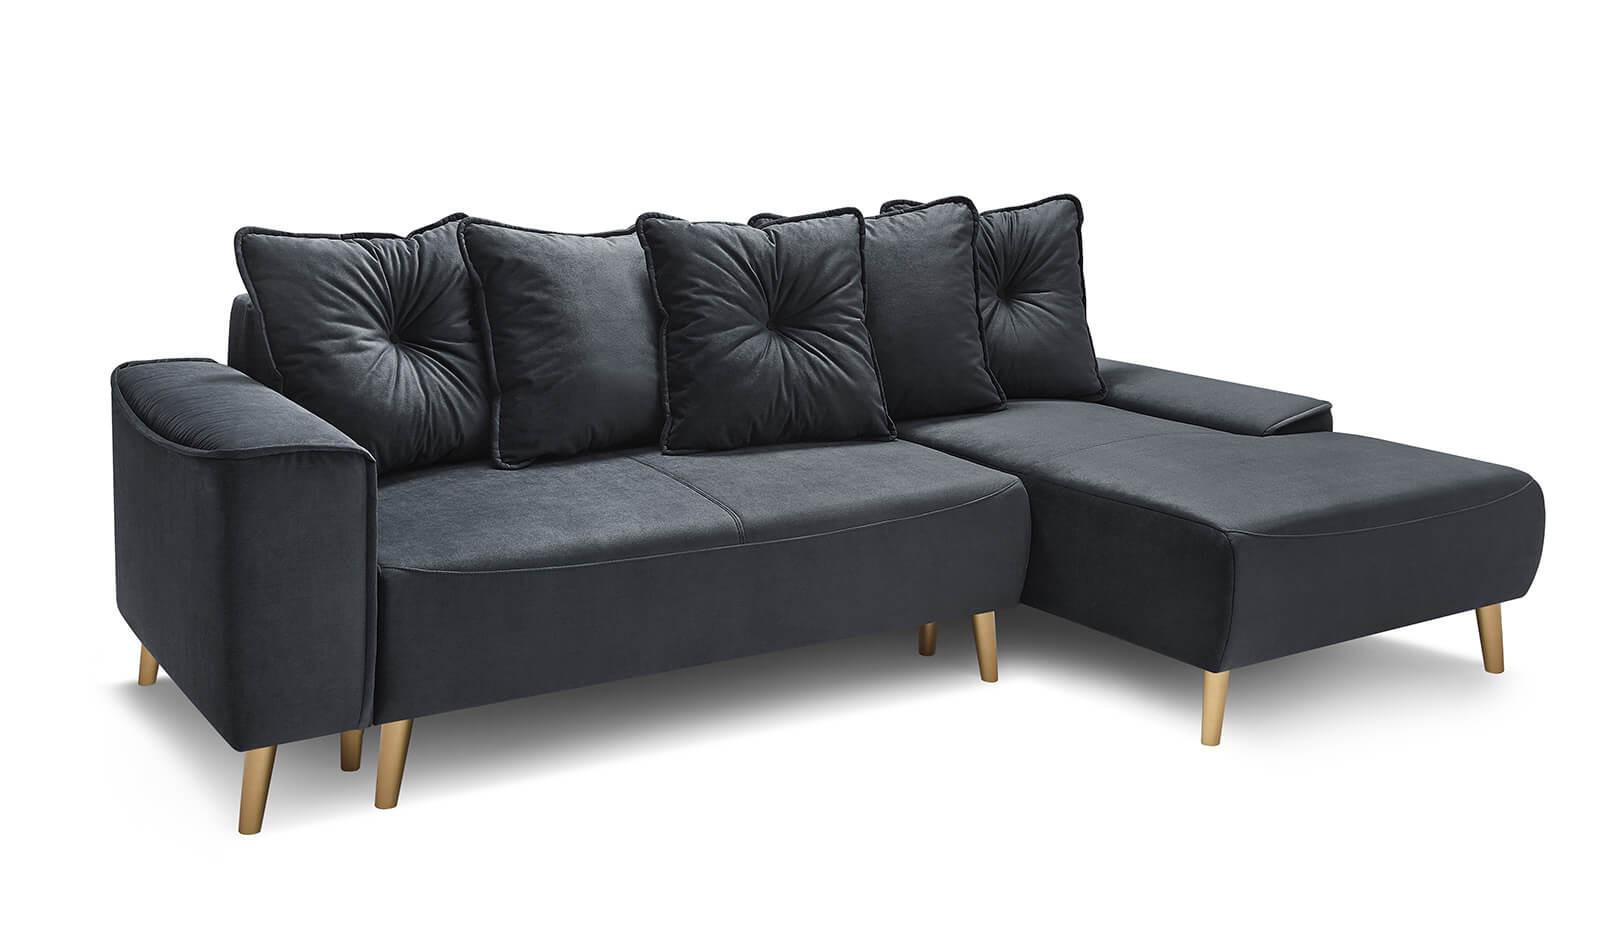 Corner Convertible Sofa Feet Gold Hera | Bobochic ® à Canape Convertible Original